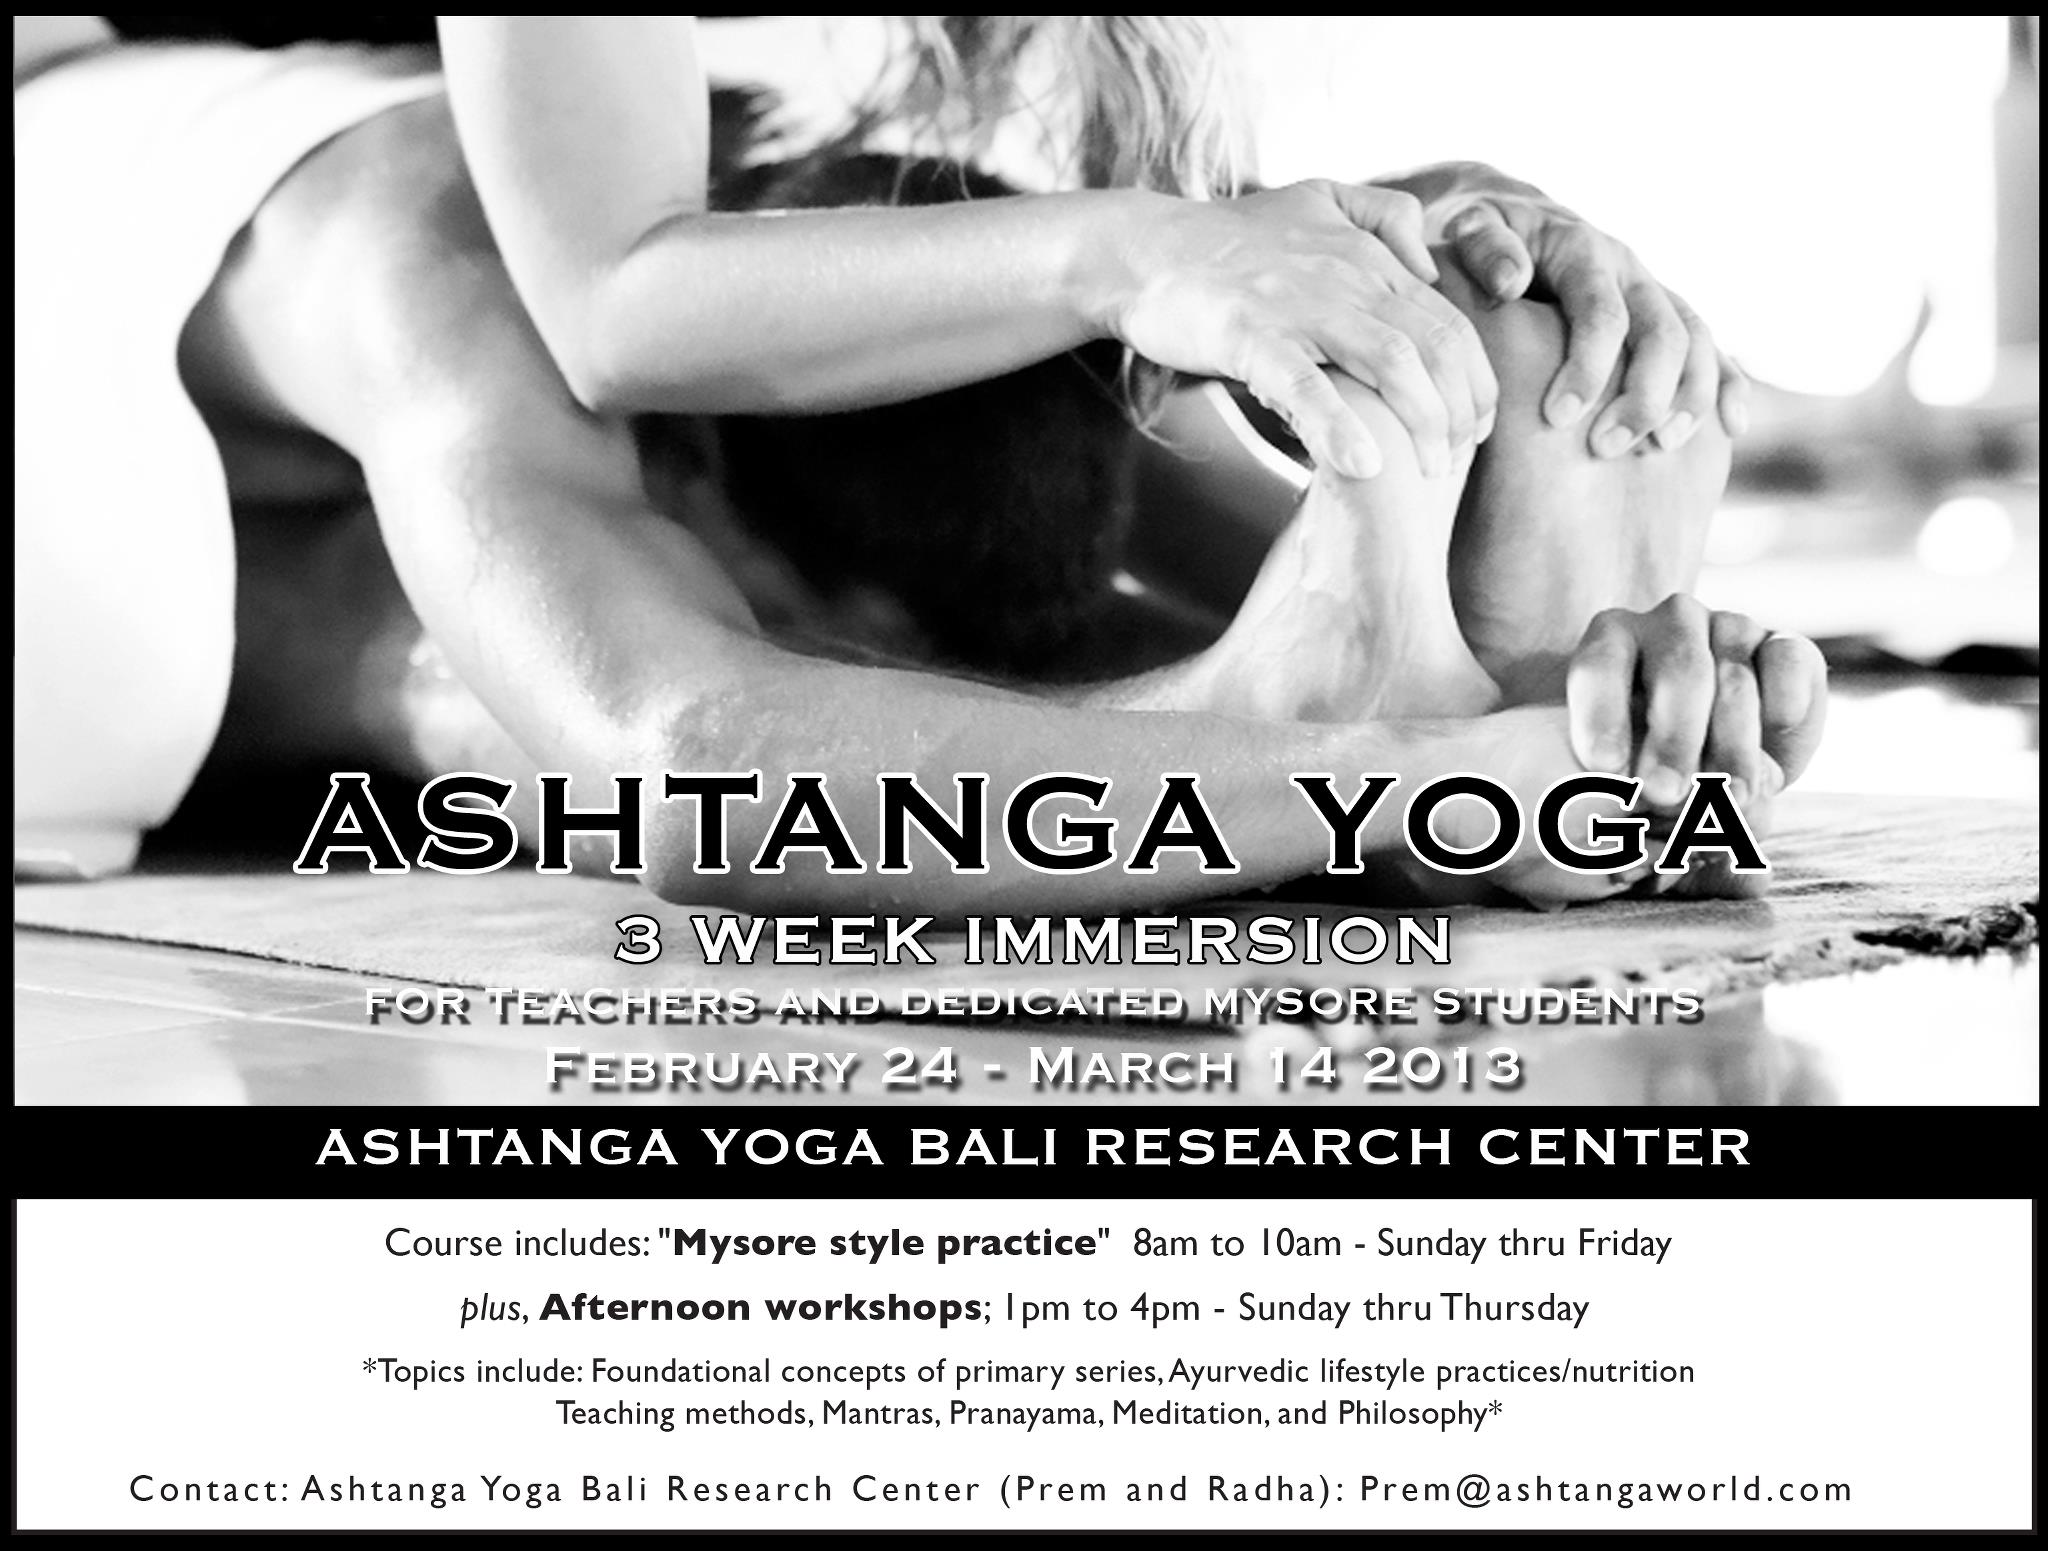 ashtanga-yoga-bali-research-center-bali-indonesia-8